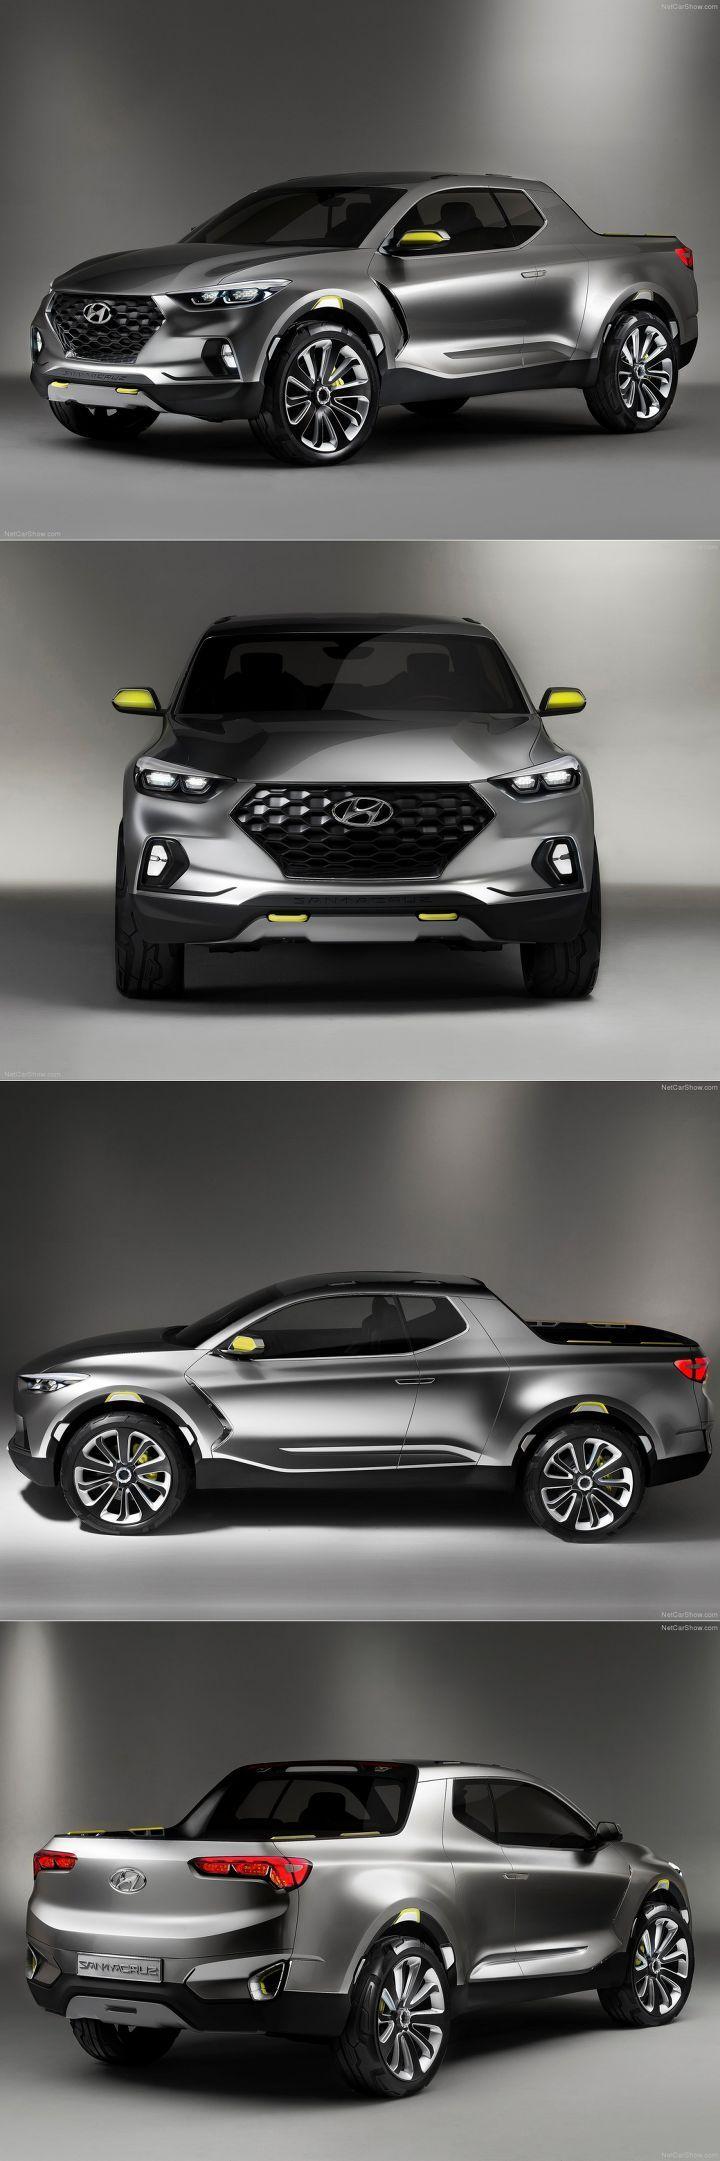 Hyundai santa cruz pickup truck detroit auto show 2015